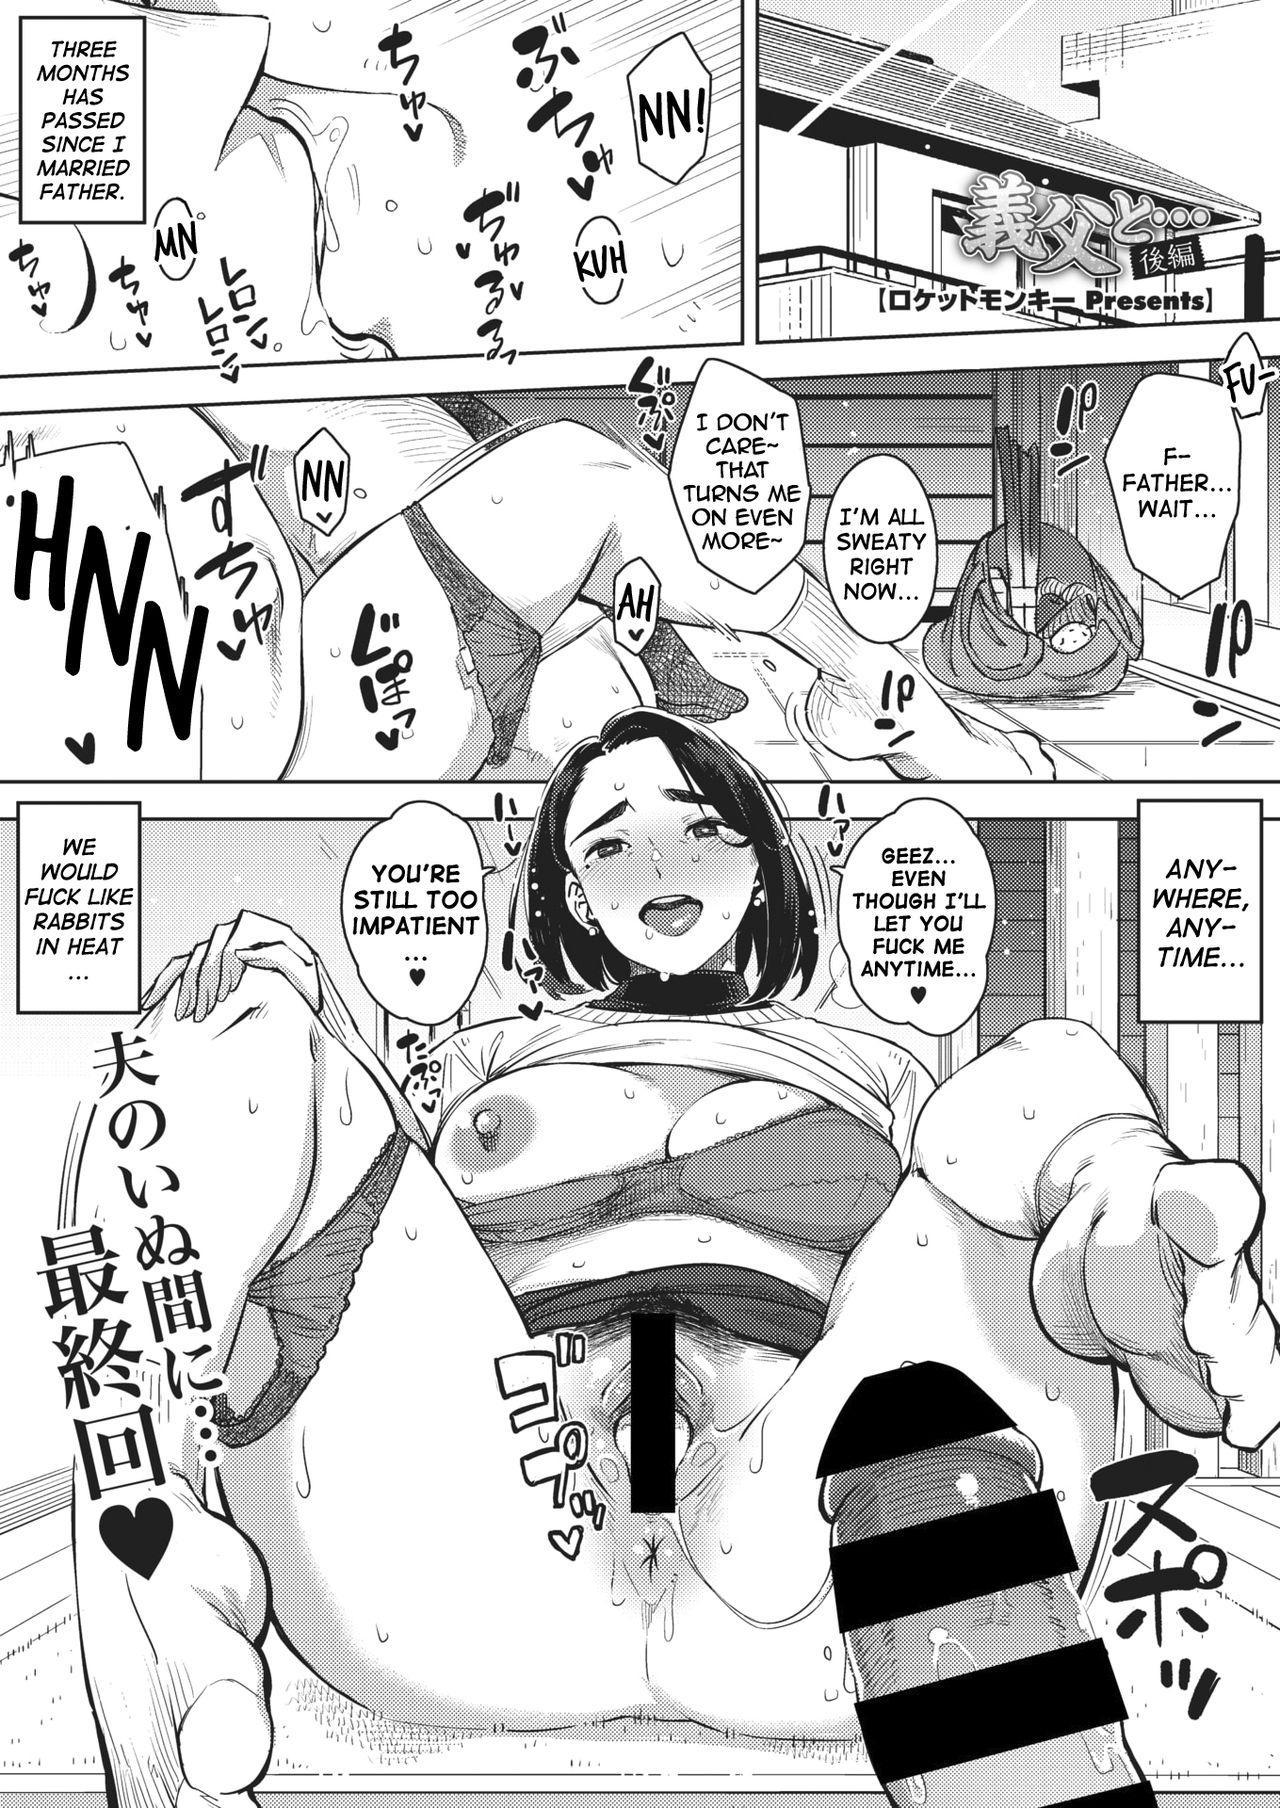 [Rocket Monkey] Gifu to... Kouhen | With My Father-in-Law... Third Part [English] [Ojama TL] 0